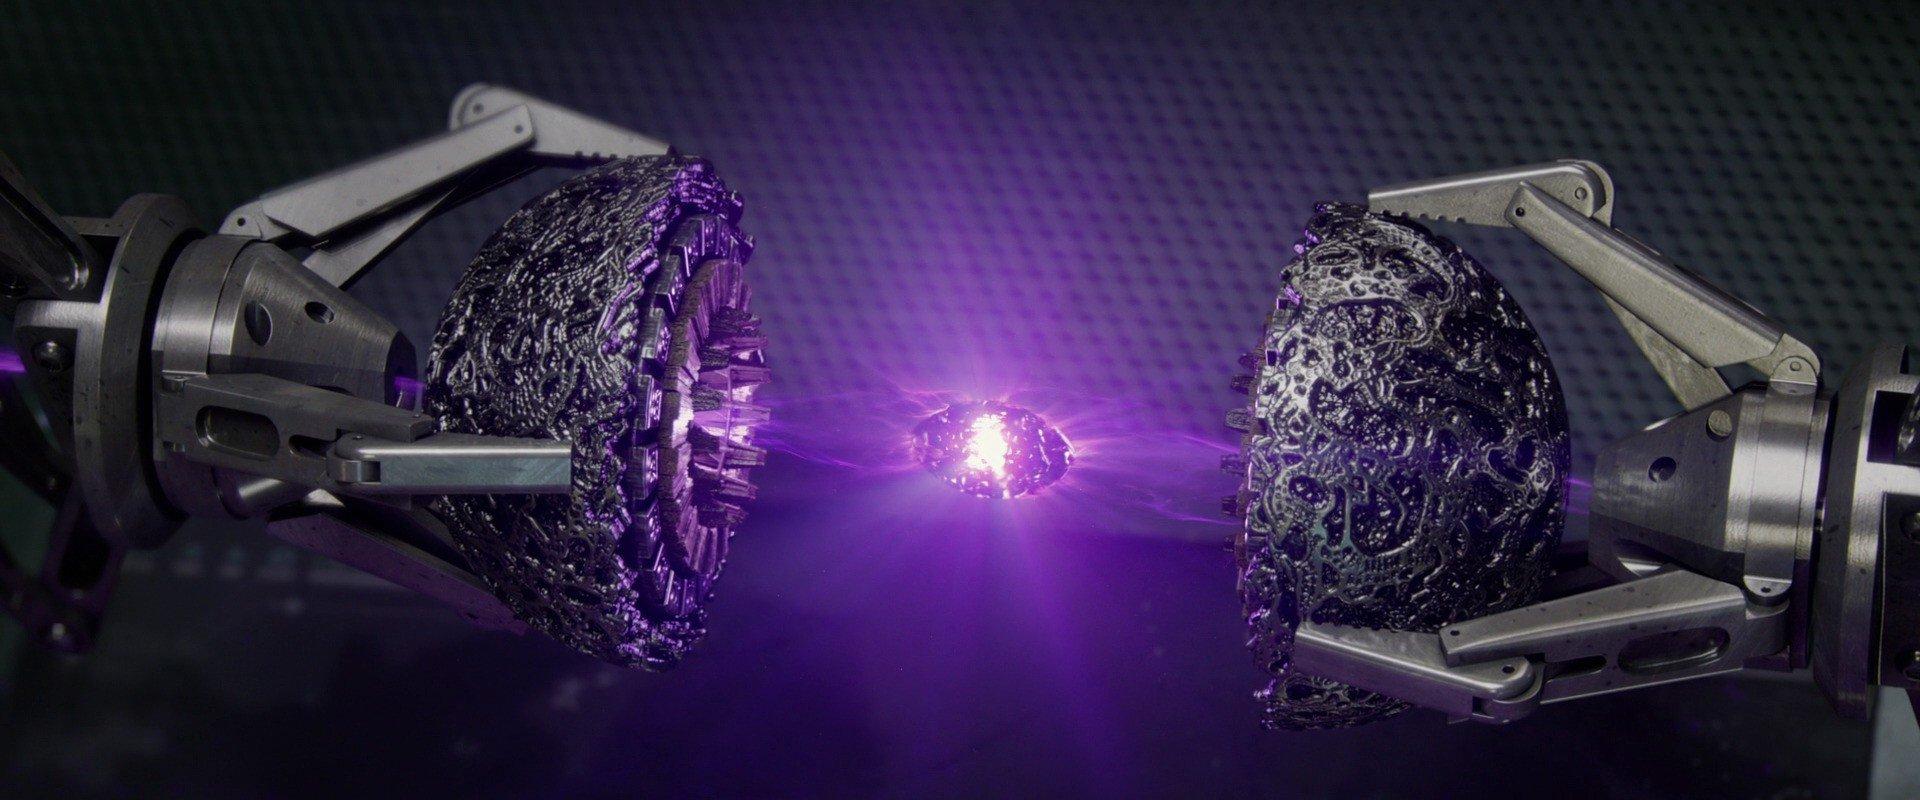 avengers-infinity-war-power-stone-2-9mood